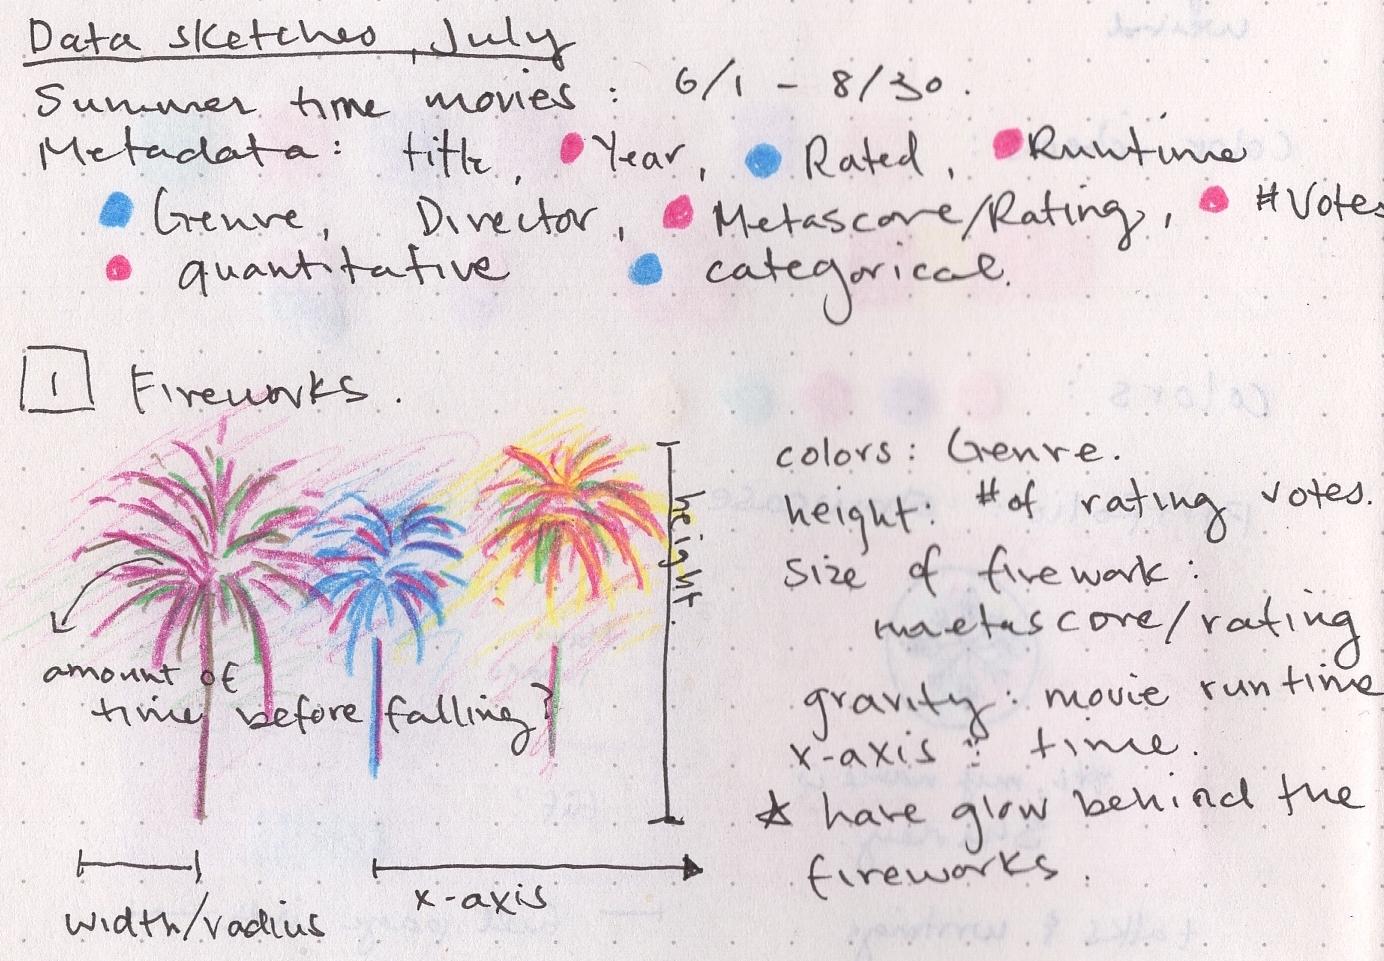 Sketch of fireworks idea